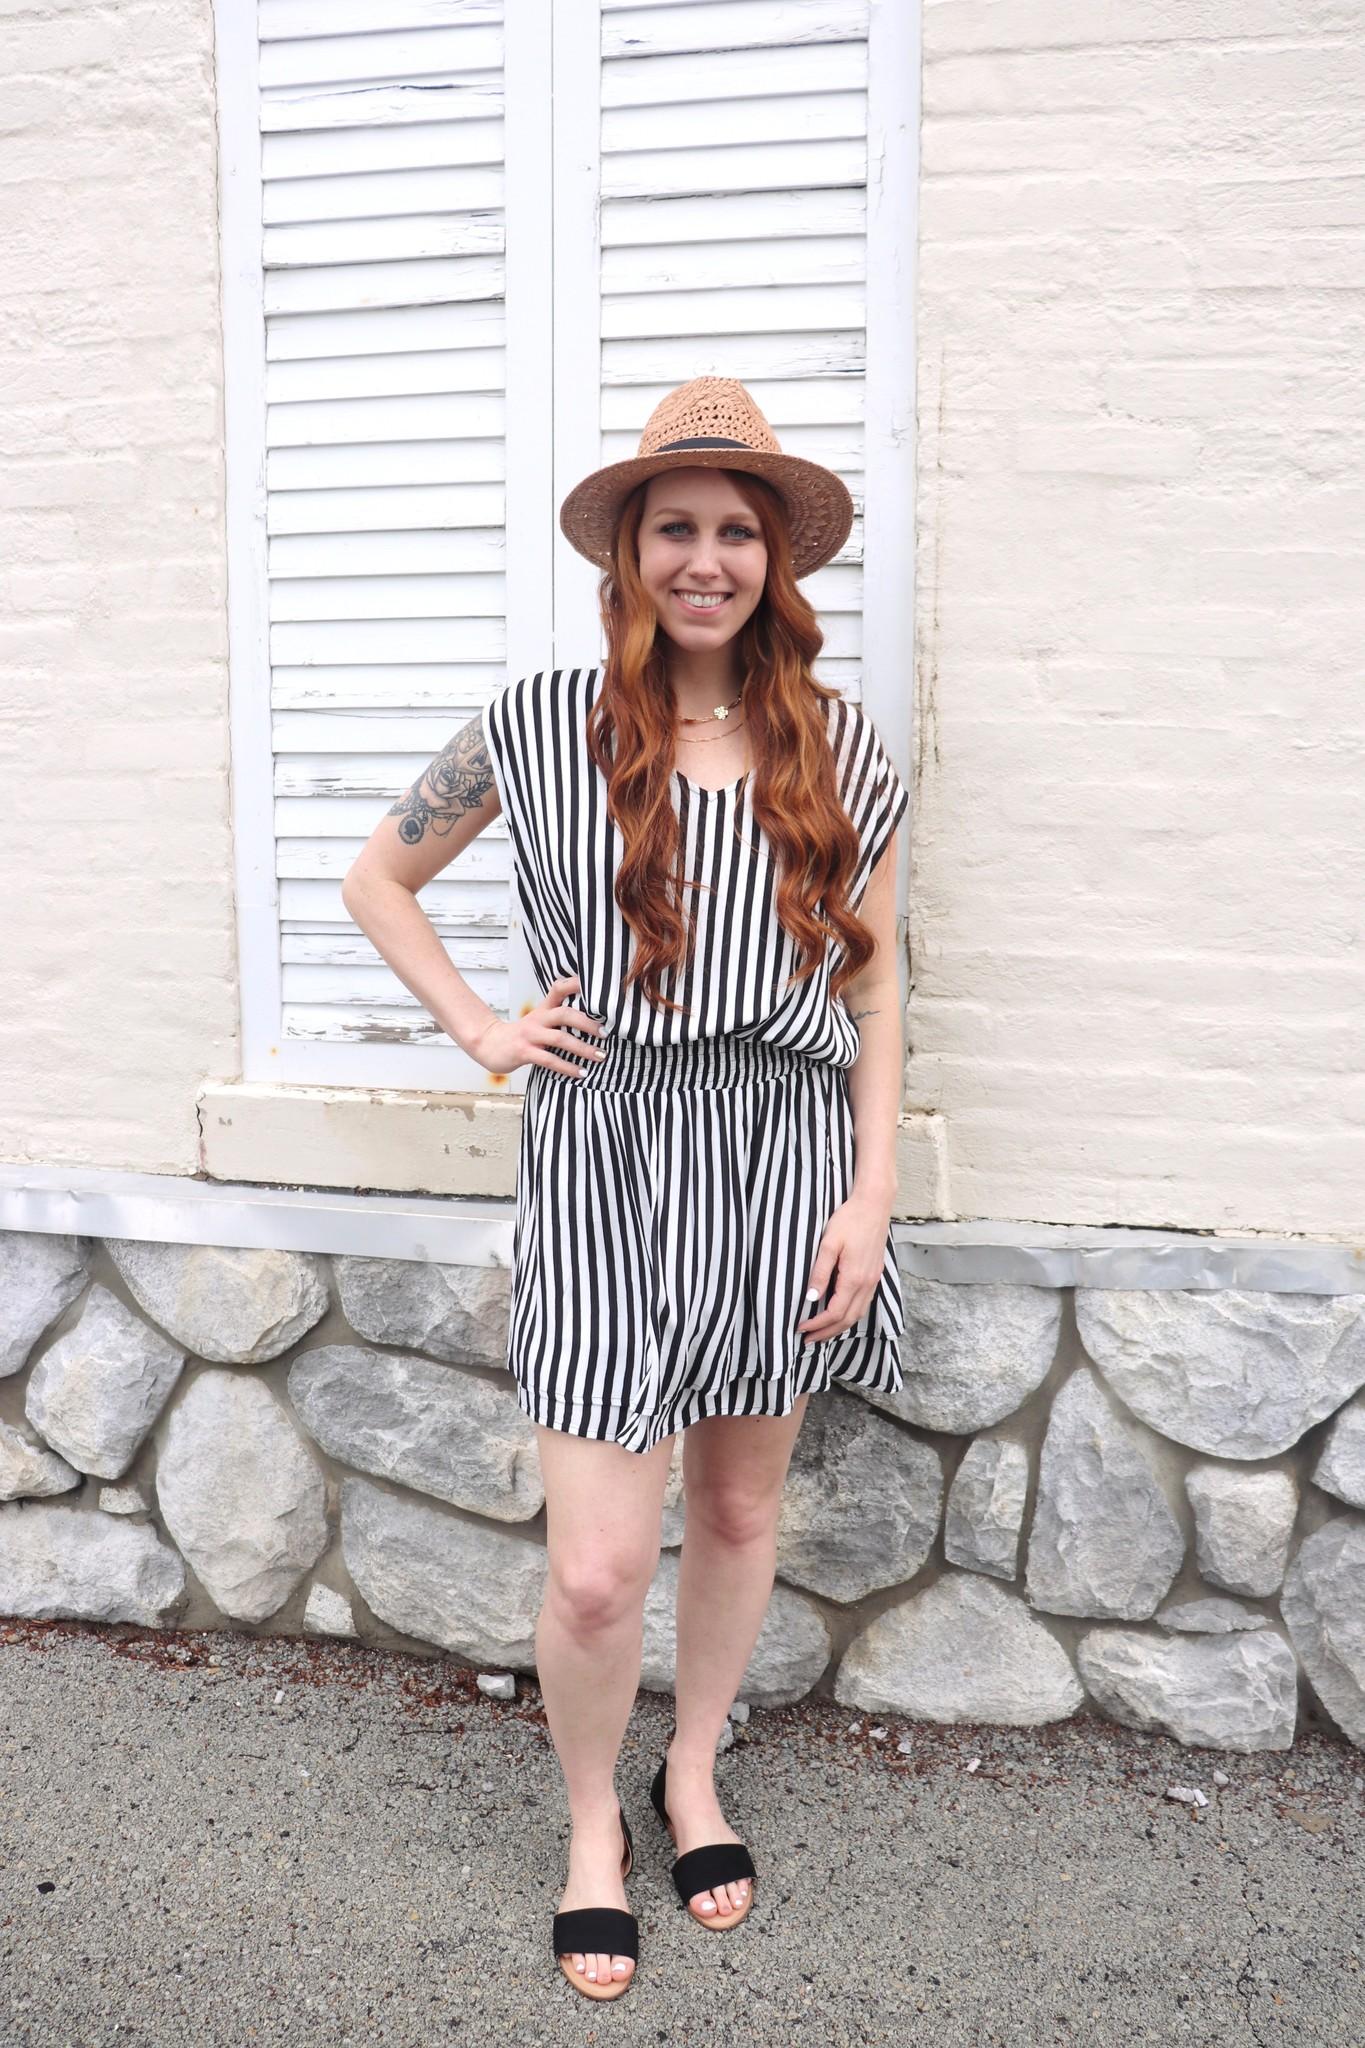 b99f2e3786b6 Black & White Stripe Smocked Sundress - Little Gypsie Boutique